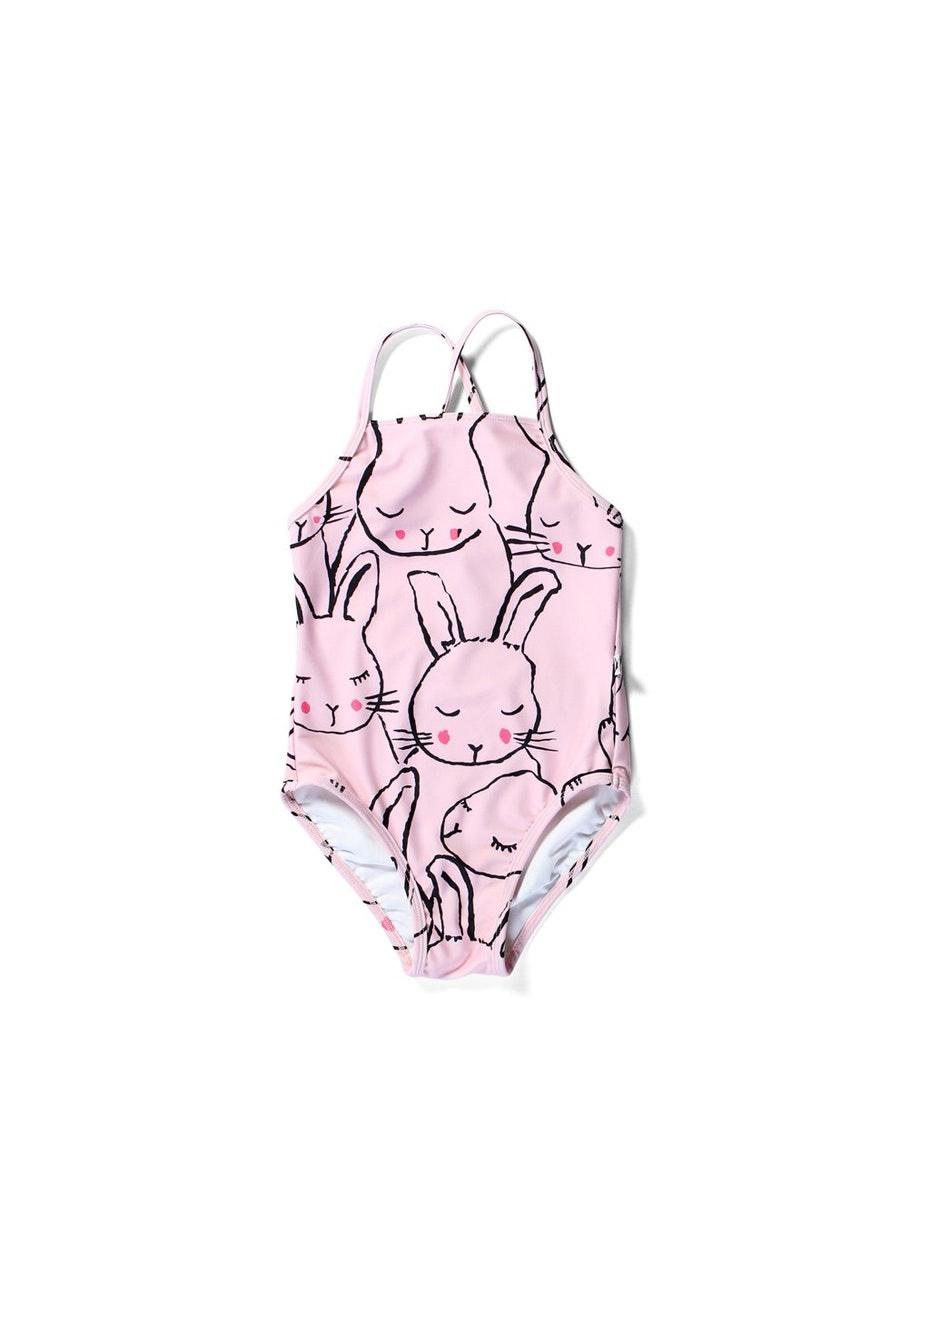 Minti - Sleepy Bunny - Swimsuit - Girls - Ballet